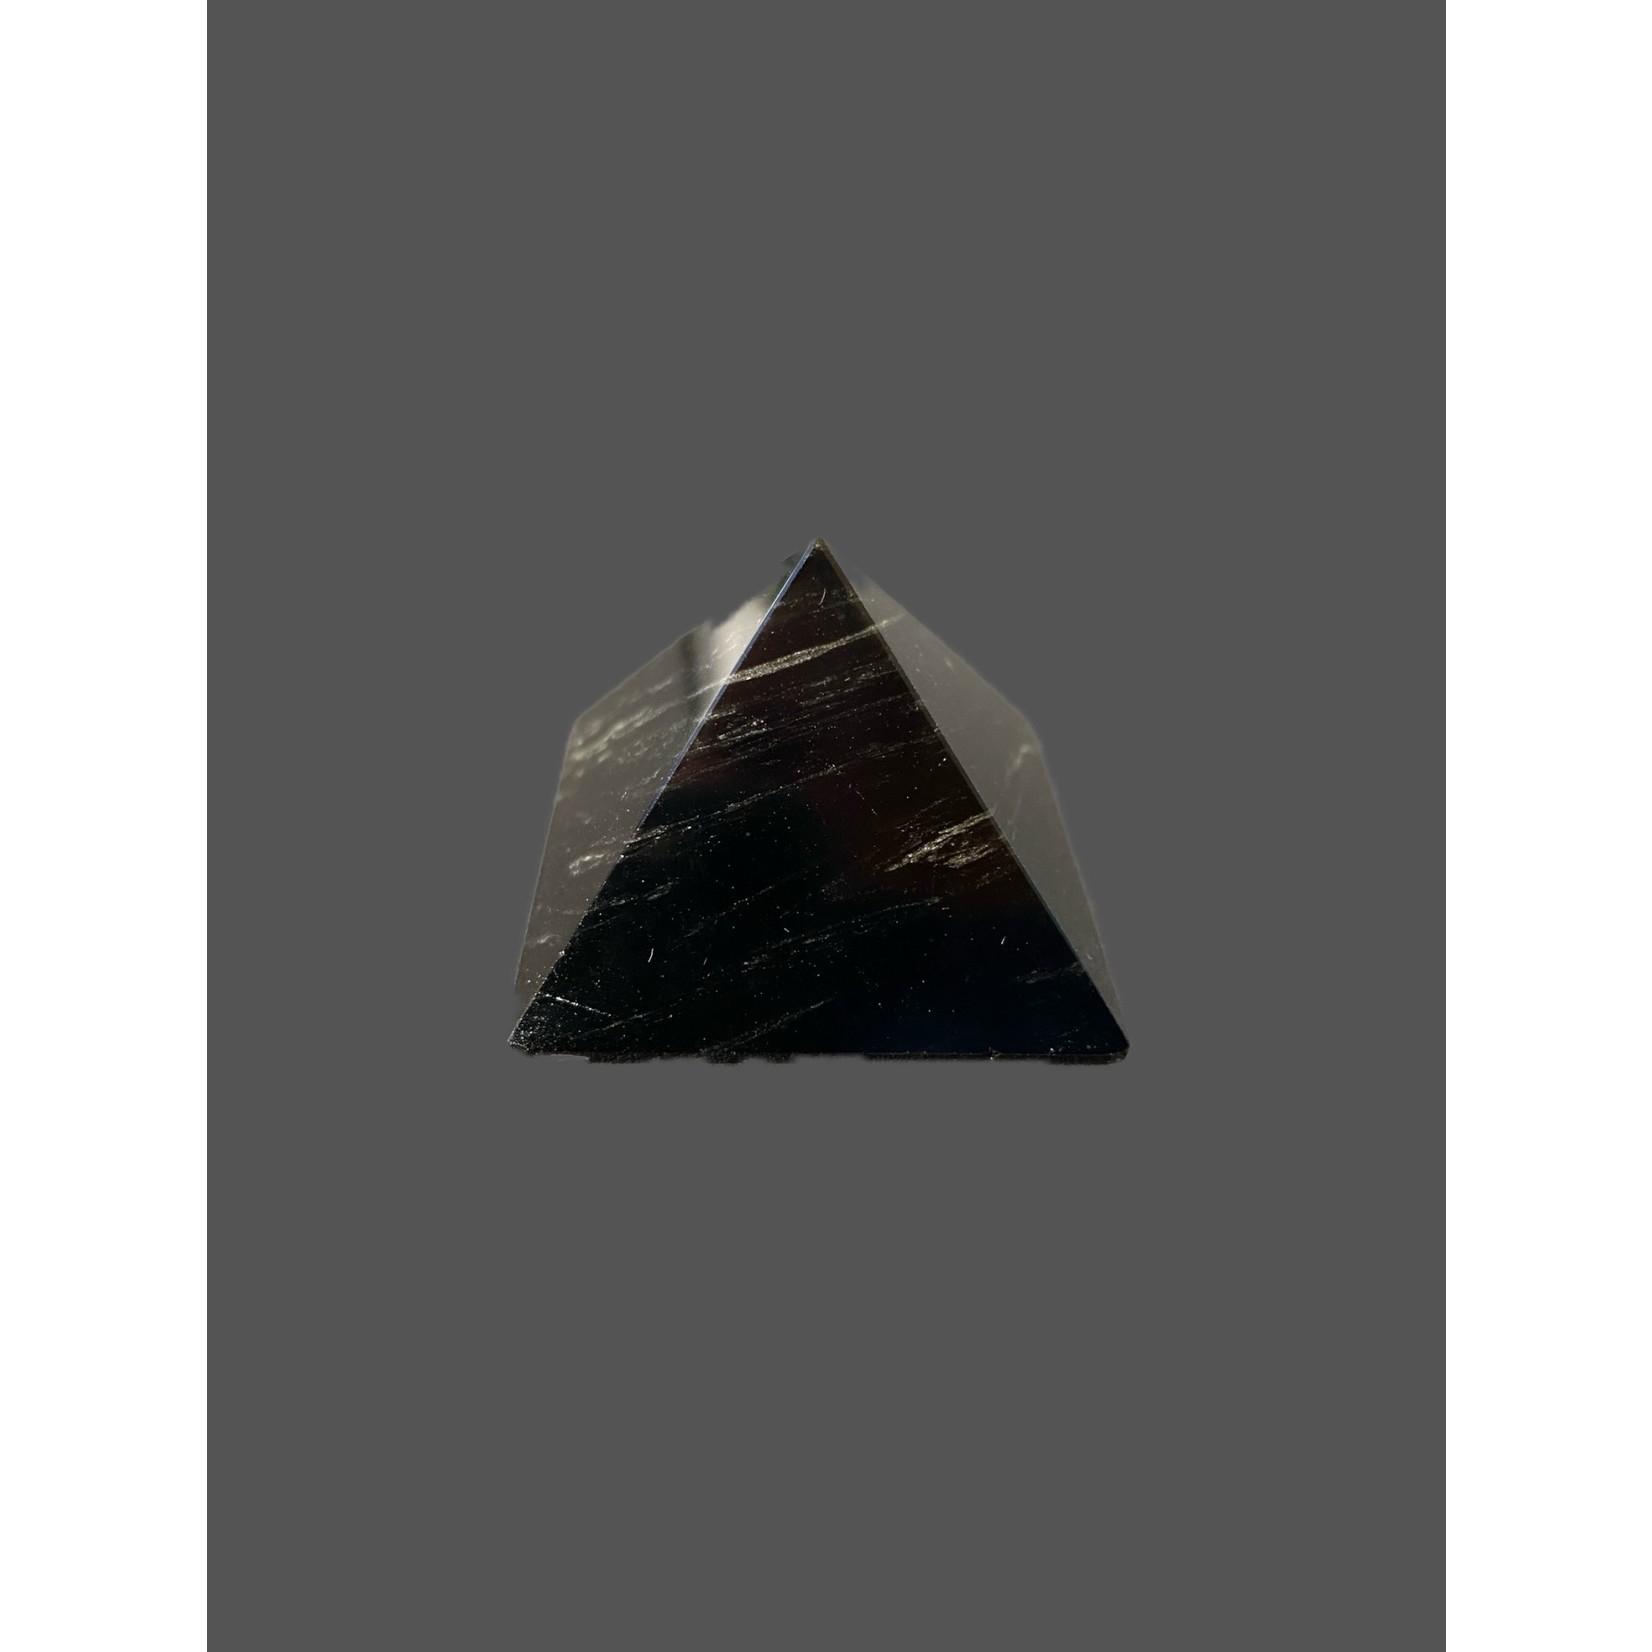 Pirámide de Obsidiana 4x4cm